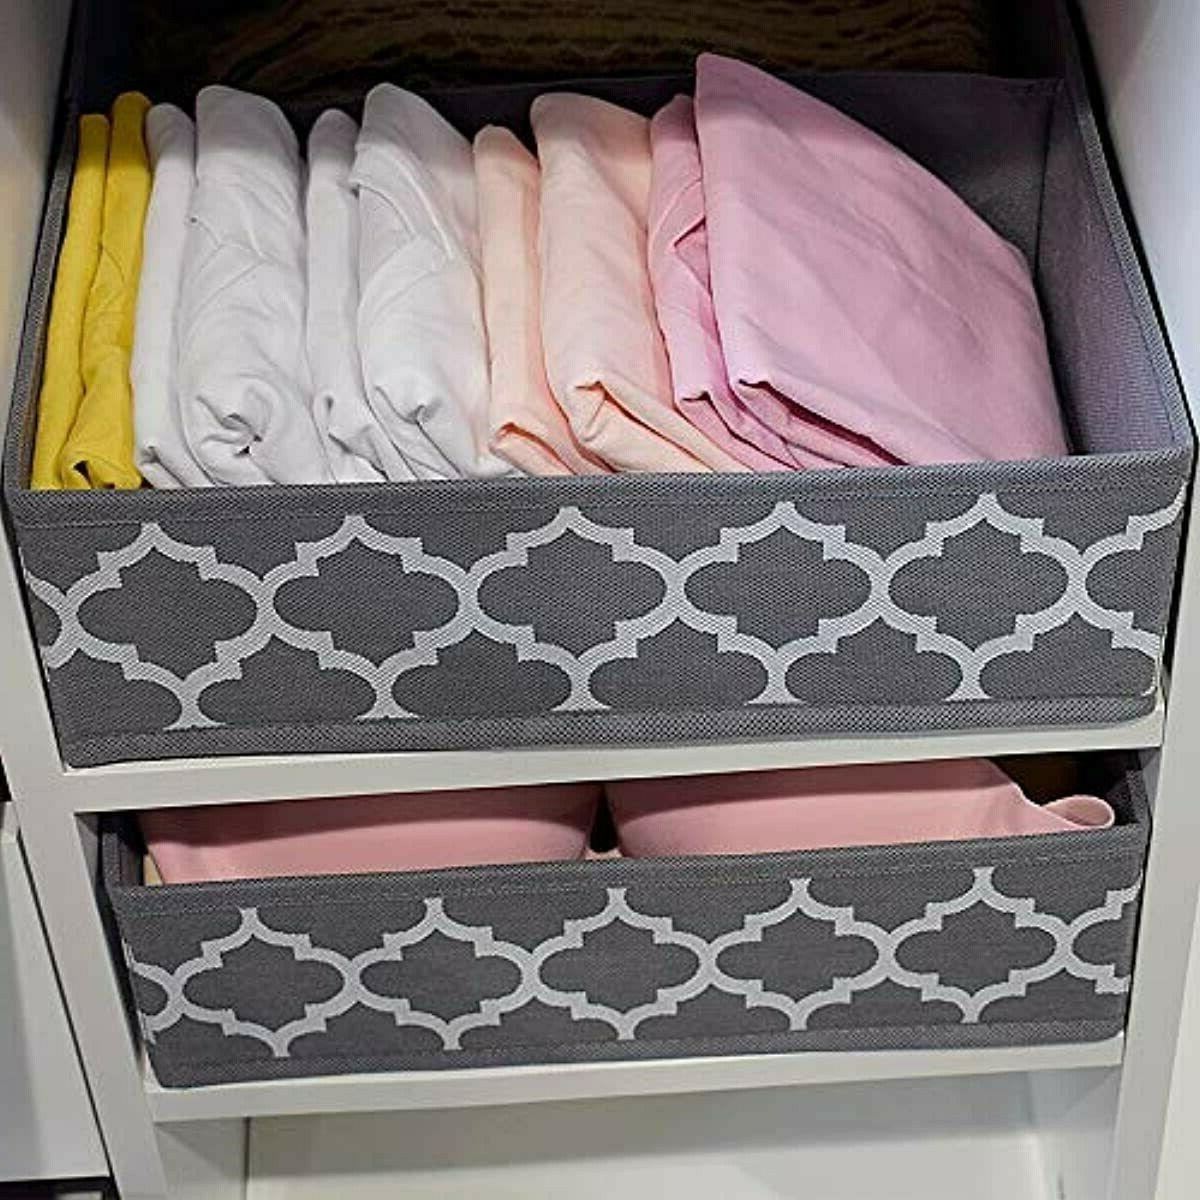 homyfort Clothes Drawer Dividers, Storage